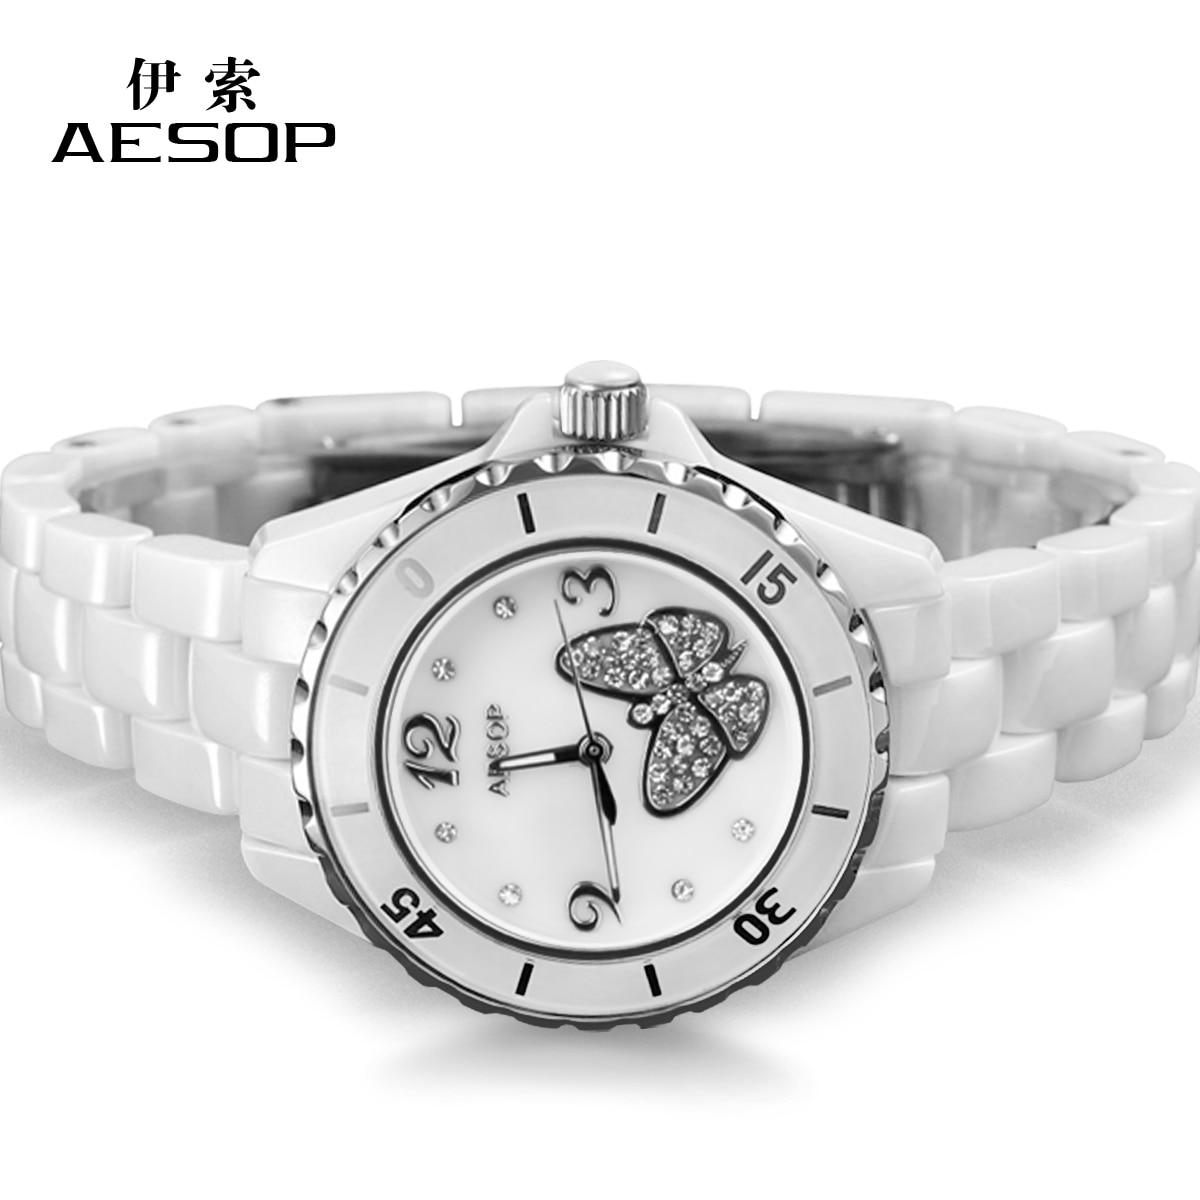 Aasop white ceramic watch aesop ladies watch waterproof fashion